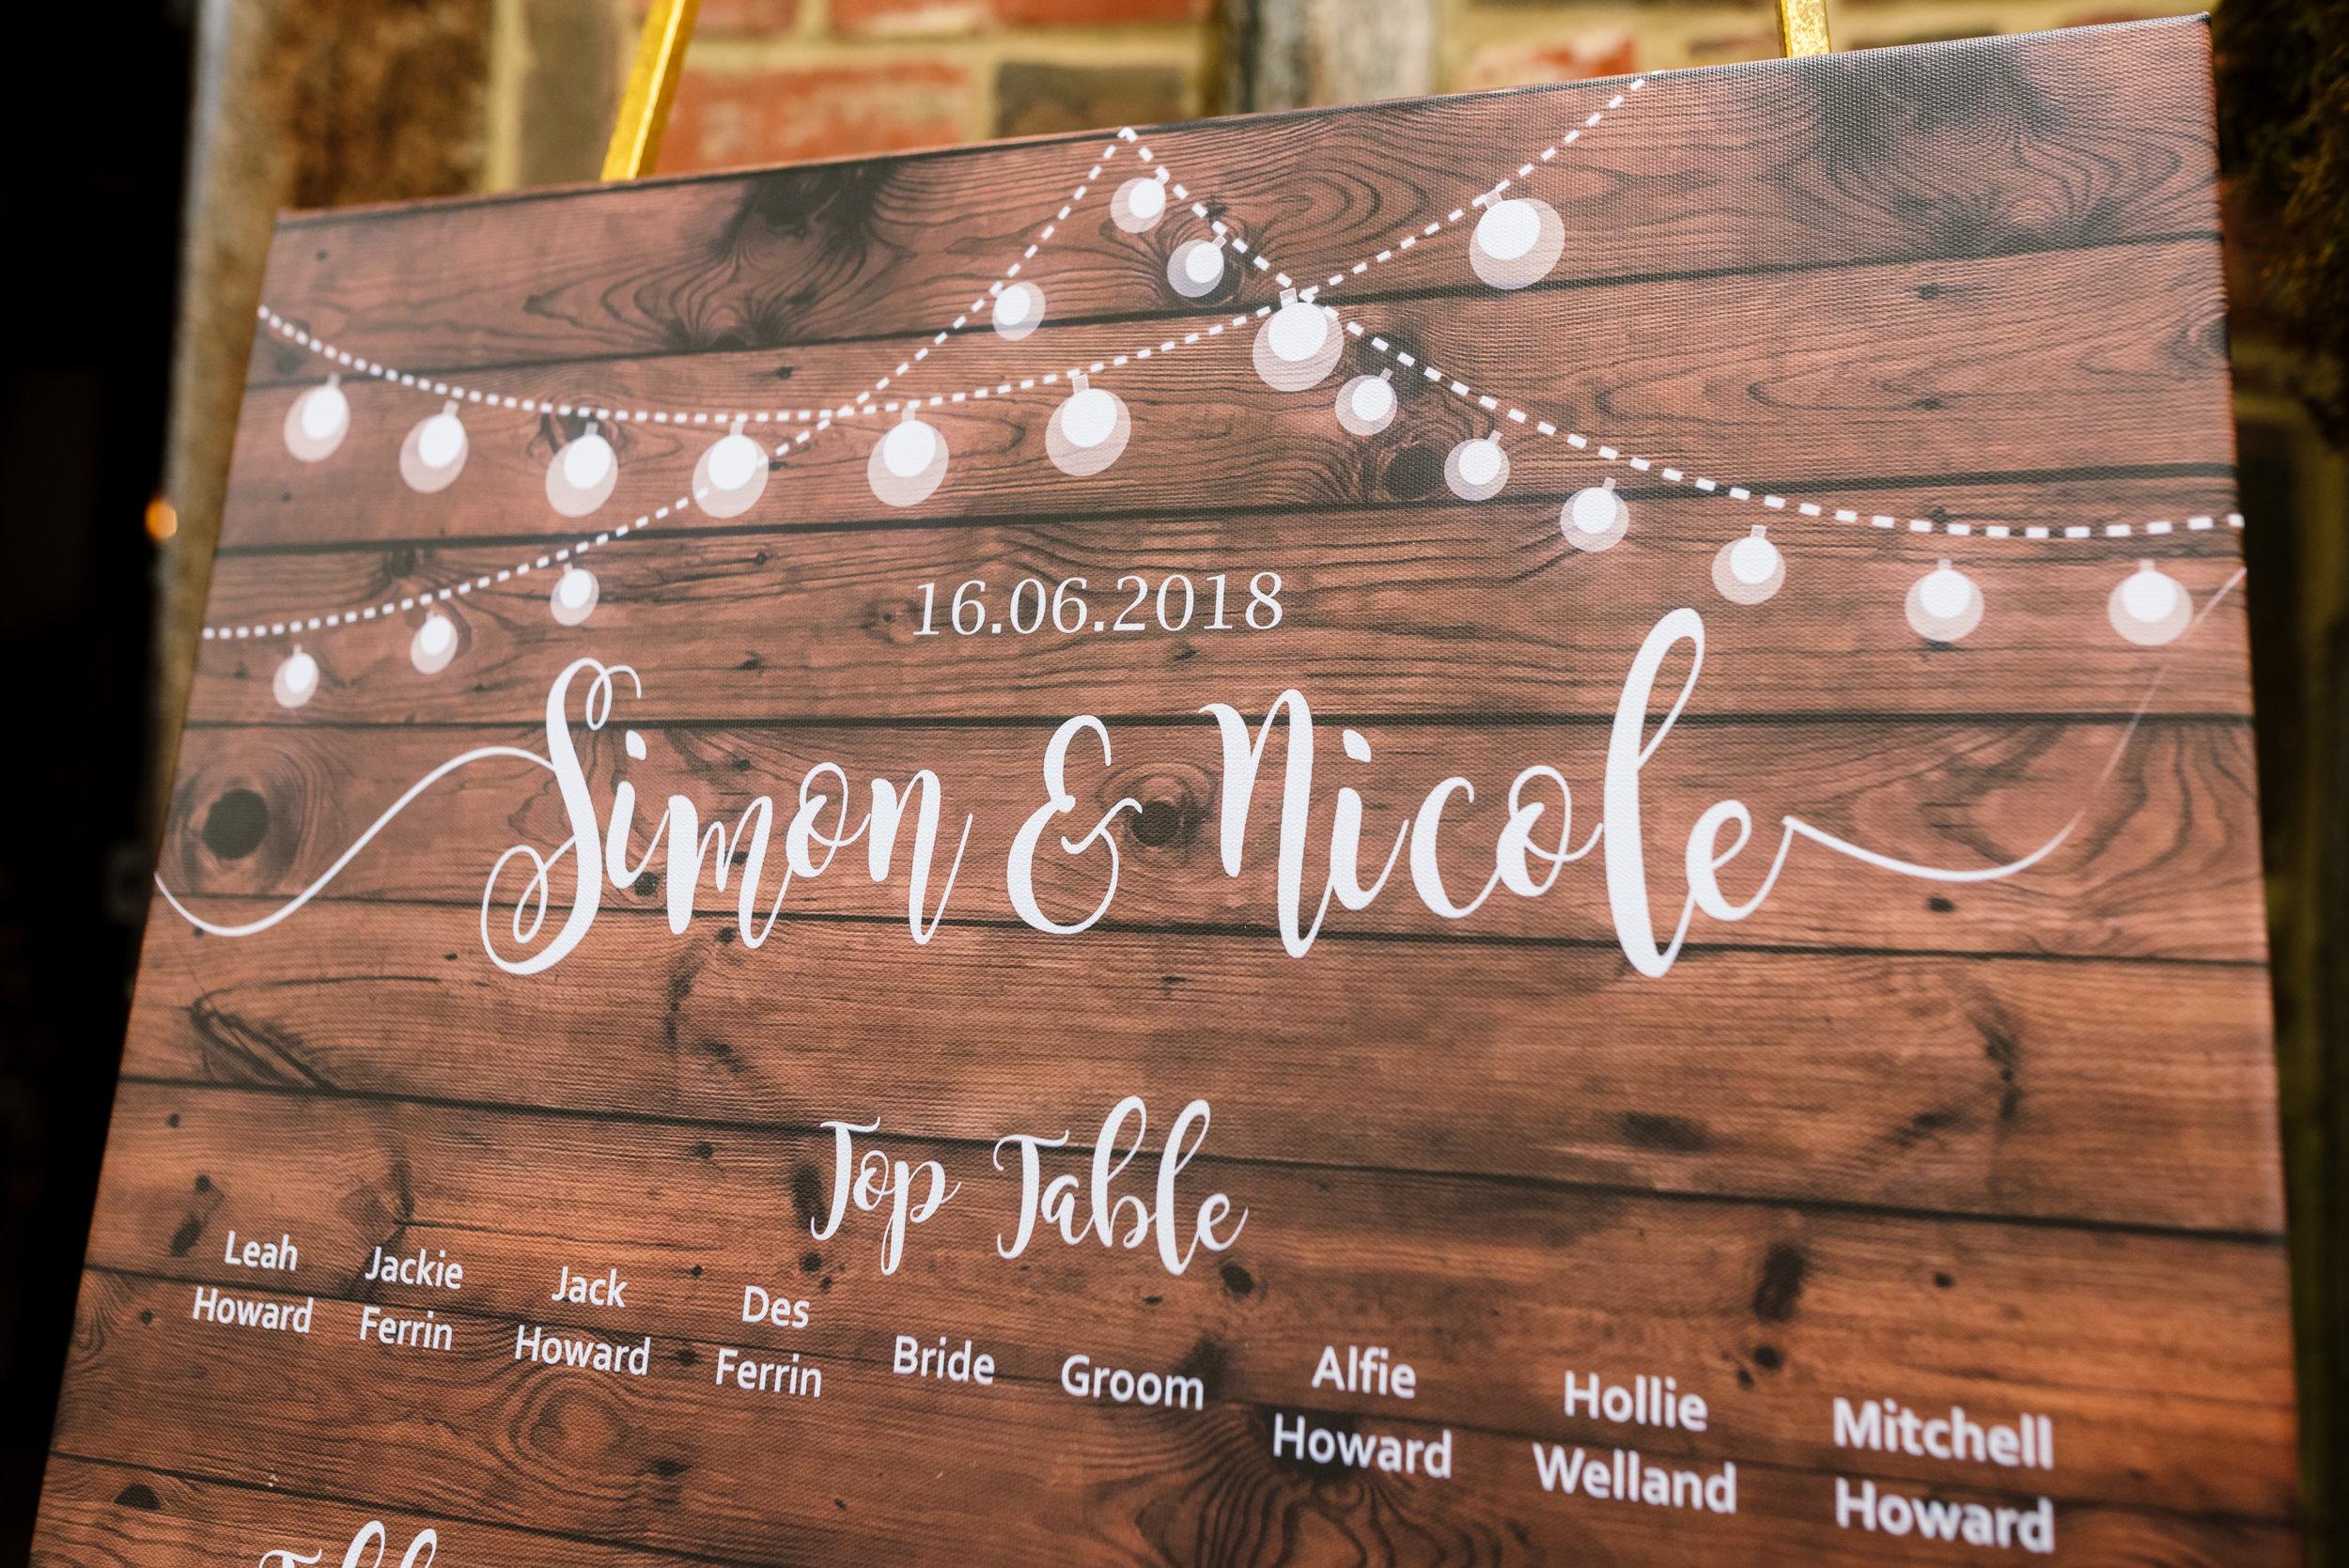 Sarah-Fishlock-Photography : Hampshire-wedding-photographer-hampshire : fleet-wedding-photographer-fleet : Meade-Hall-Wedding-Photographer : Meade-Hall-Wedding-Photos-608.jpg